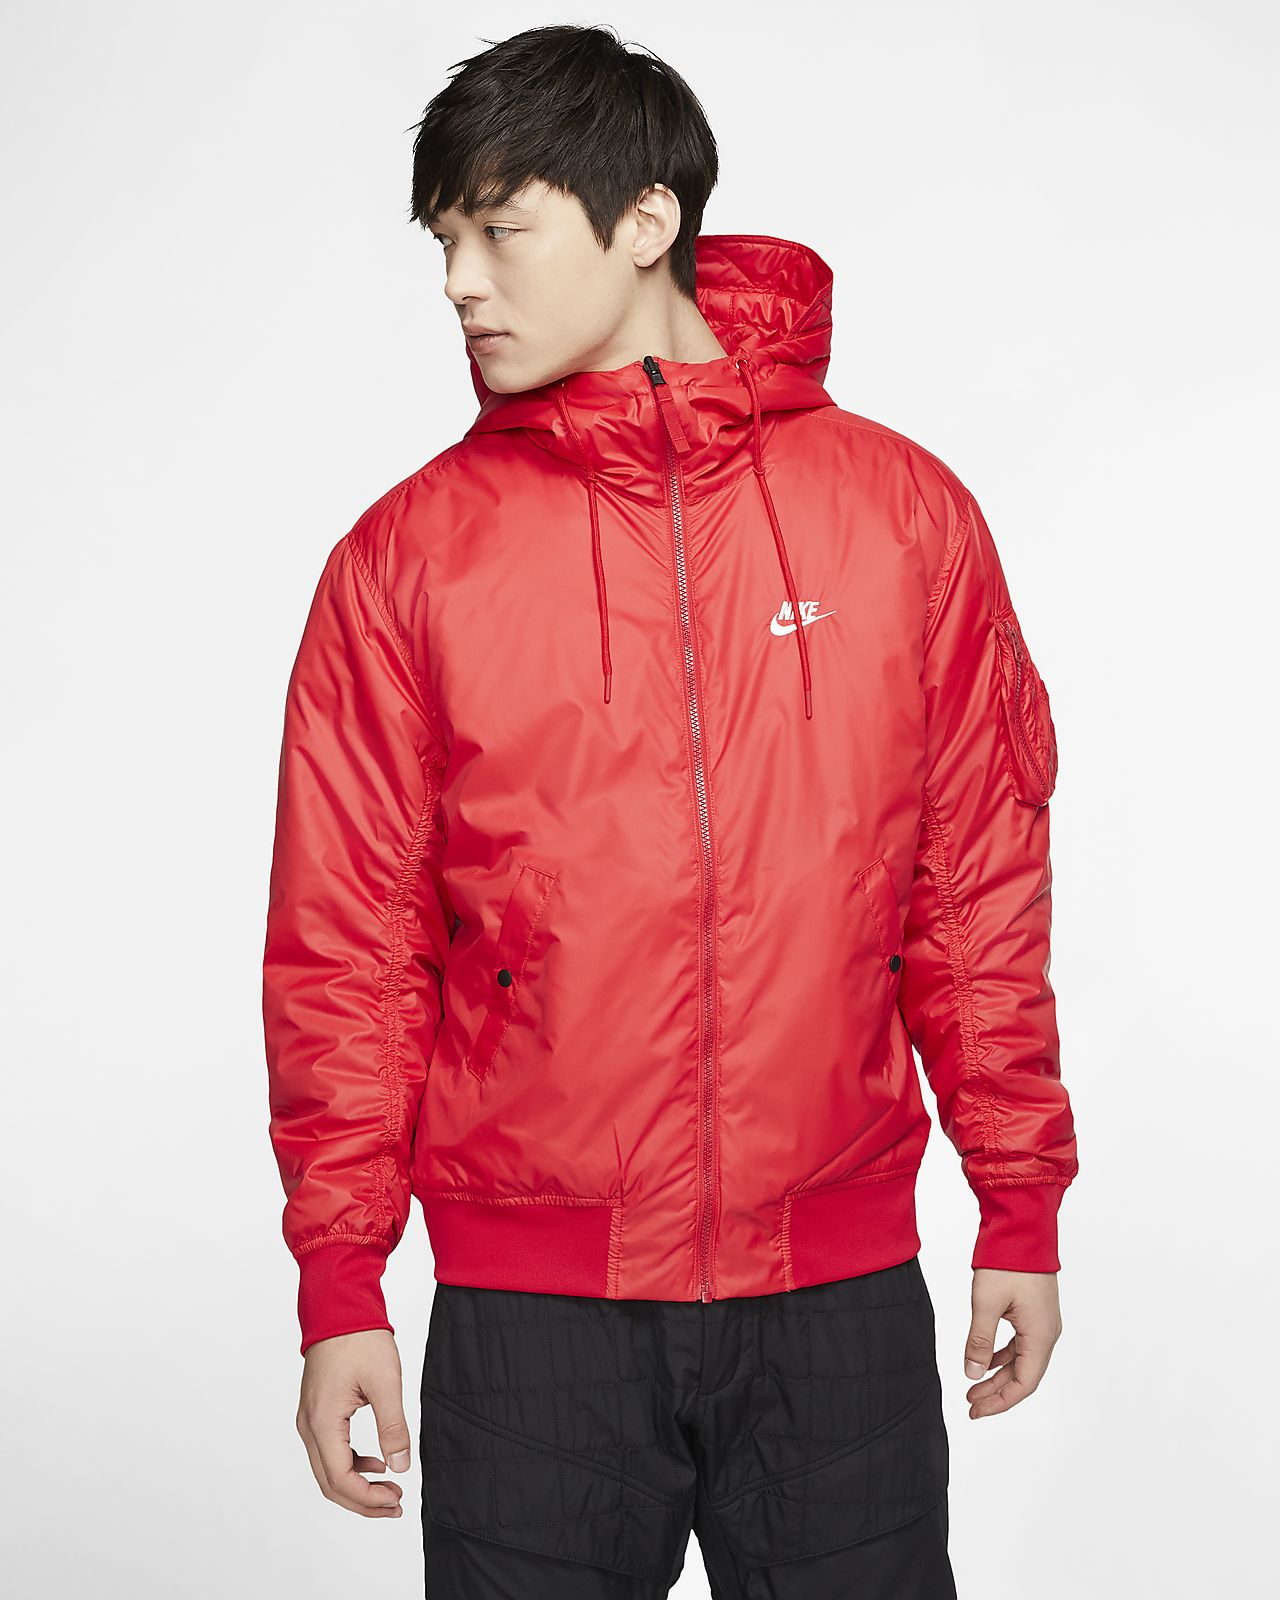 Nike Sportswear Windrunner Men's Reversible Hooded Jacket